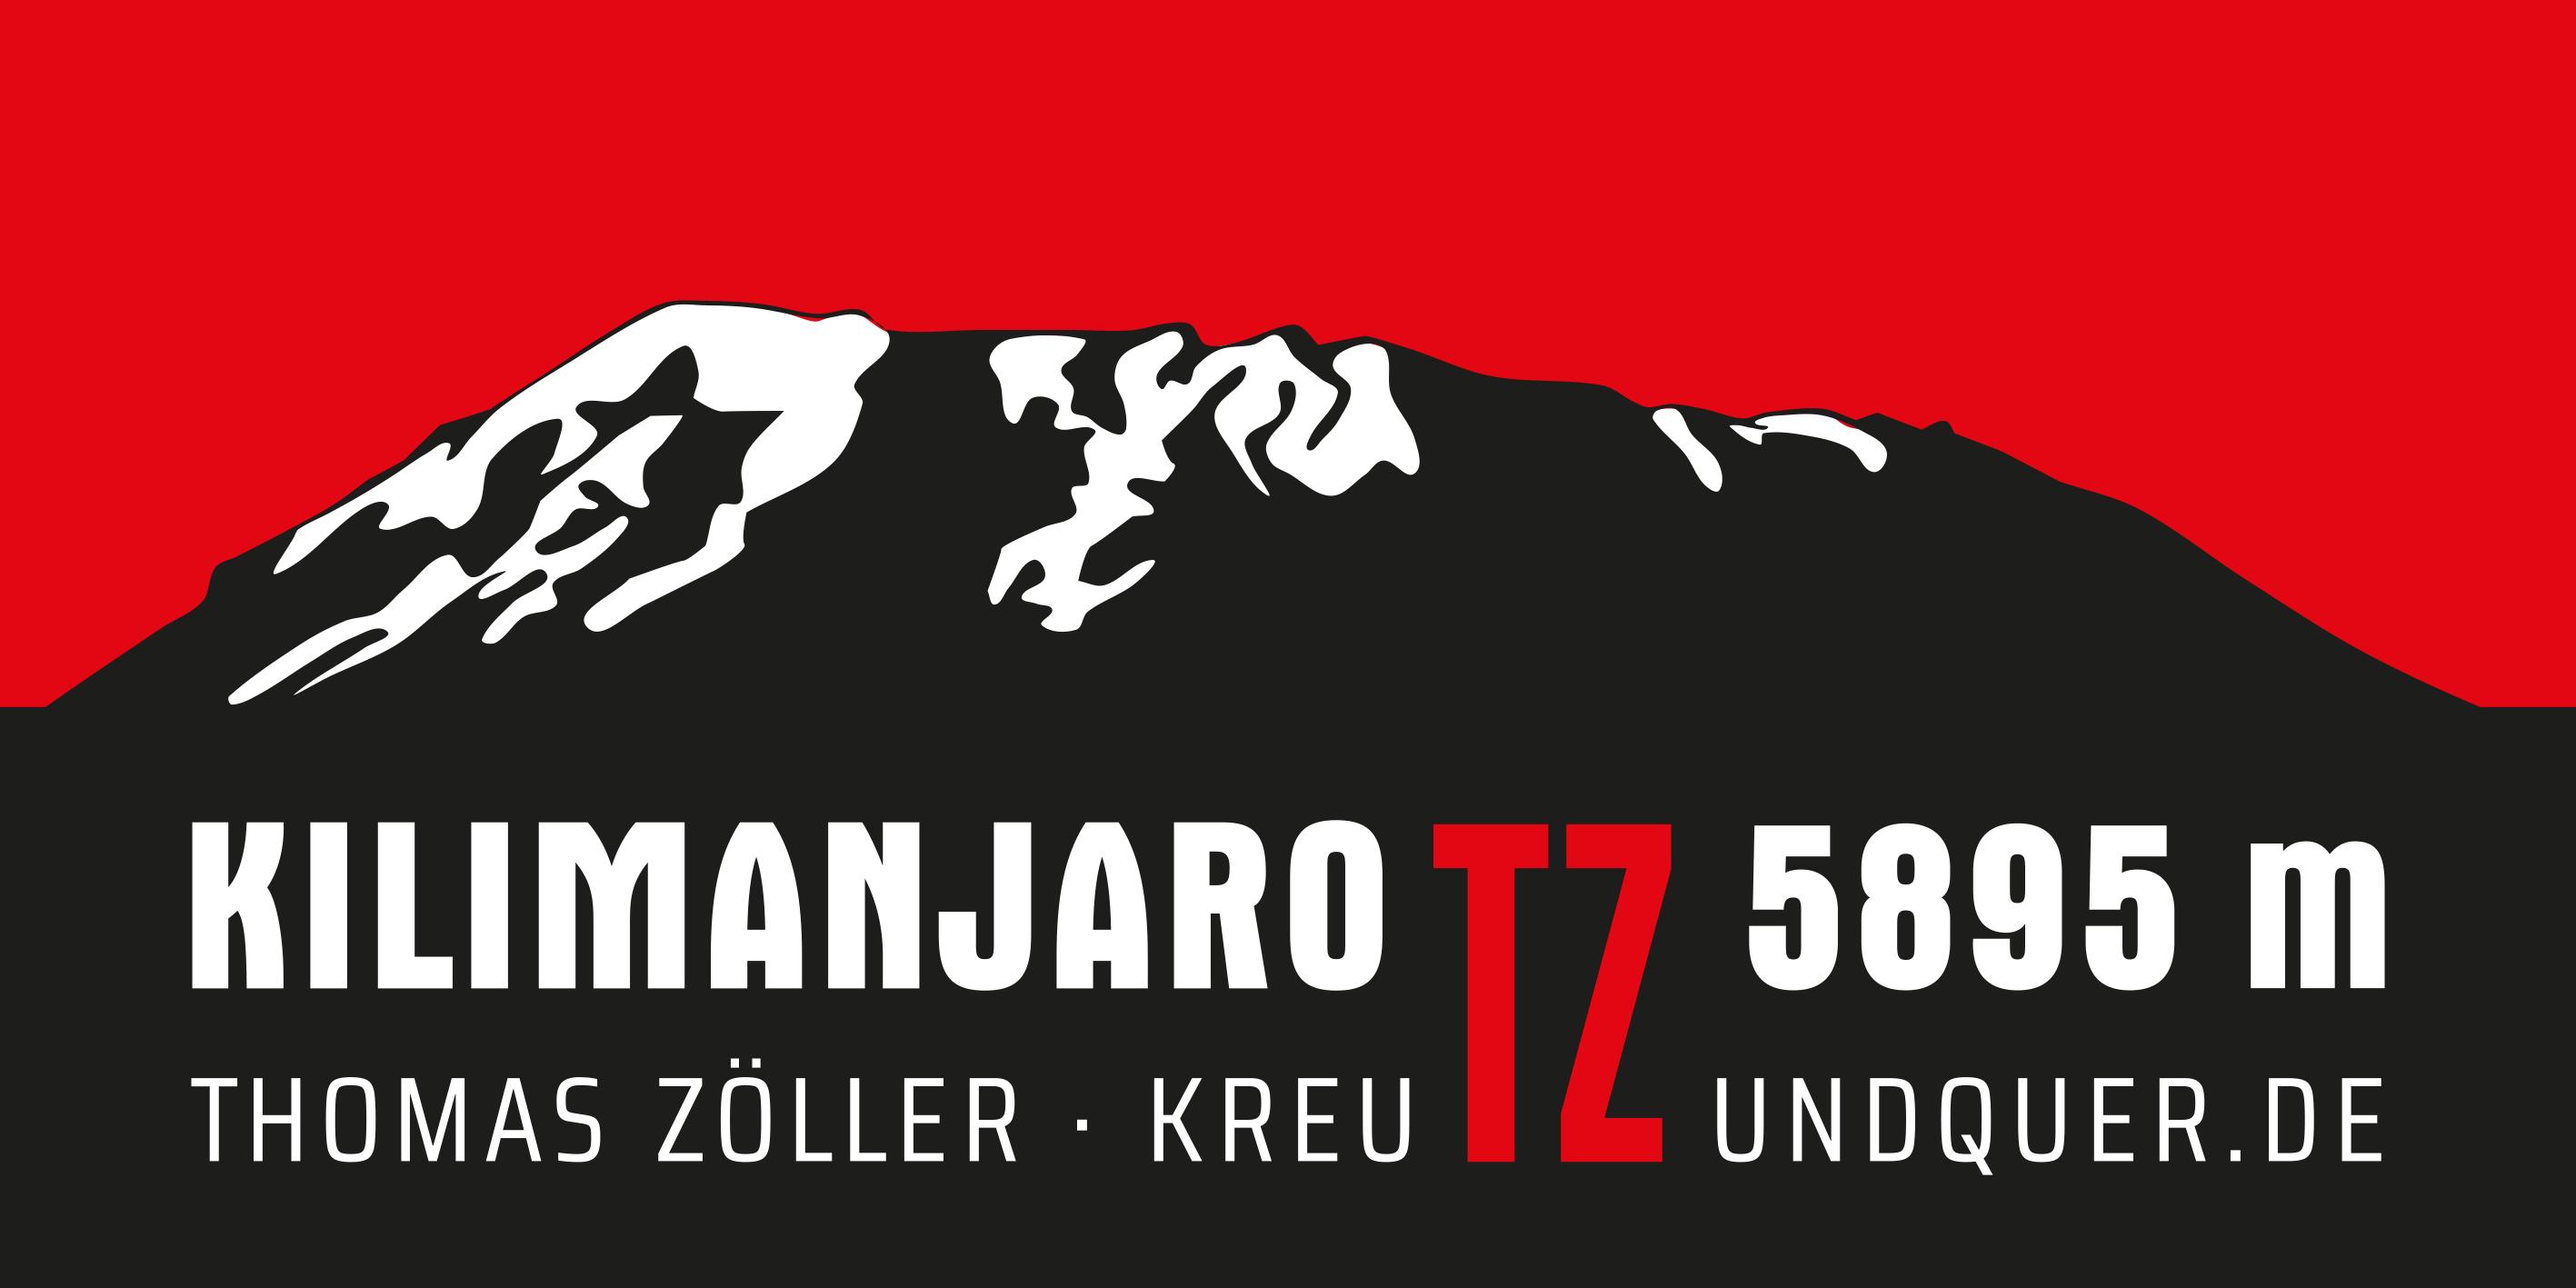 Kilimanjaro_100x50cm_pur